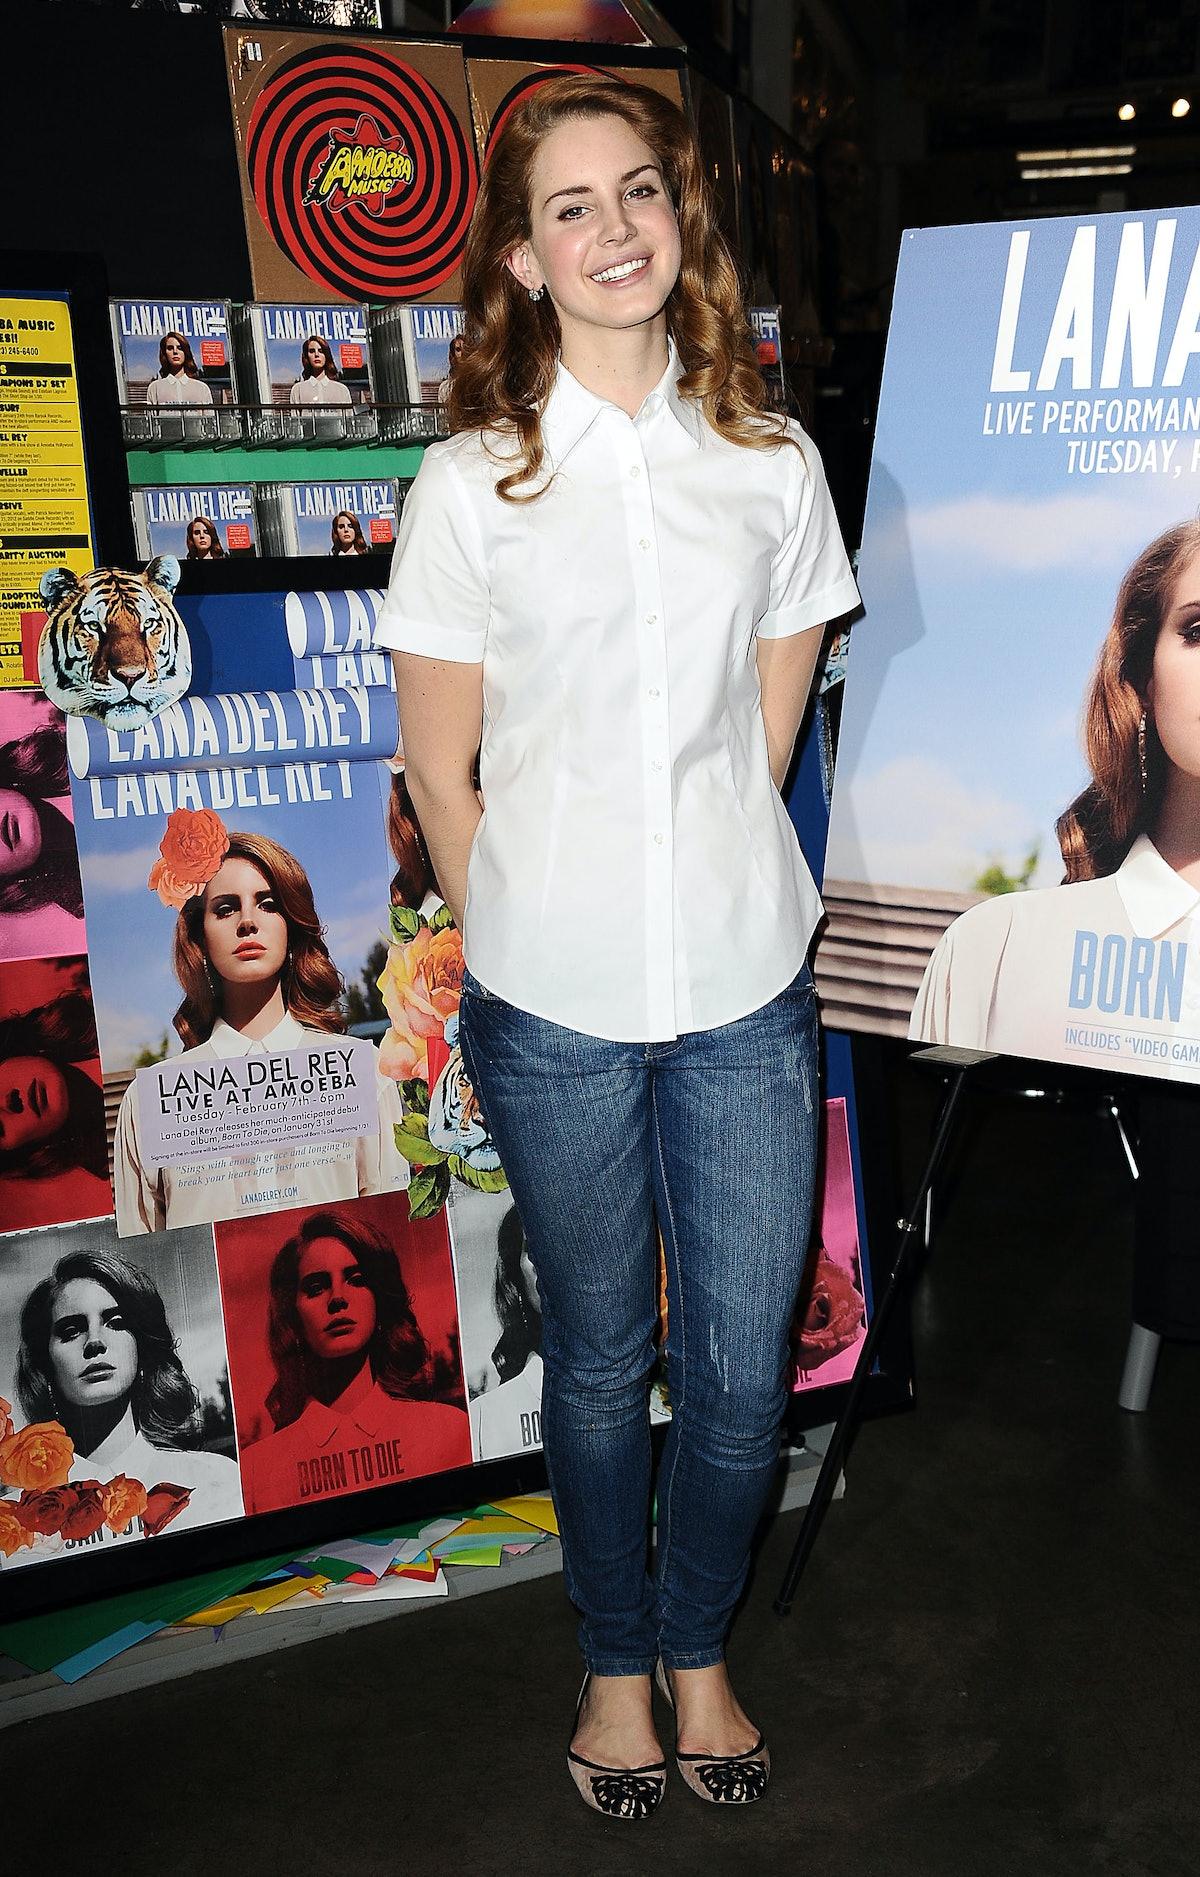 Lana Del Rey at Amoeba Music